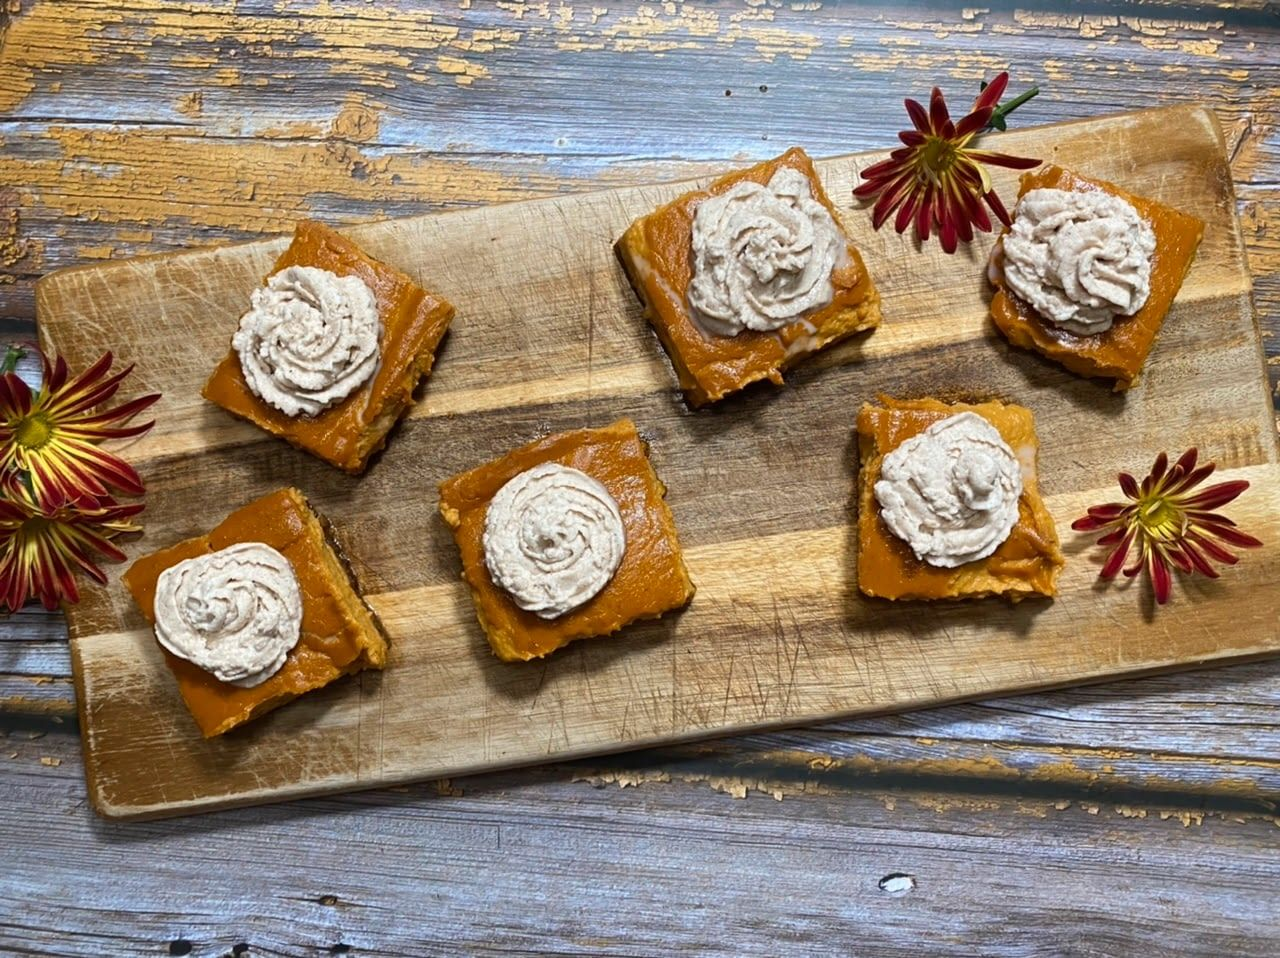 Pin By Wilmer Lugo Villarroel On Fast N Pumpkin Cheesecake Thanksgiving Food Desserts Homemade Whipped Cream